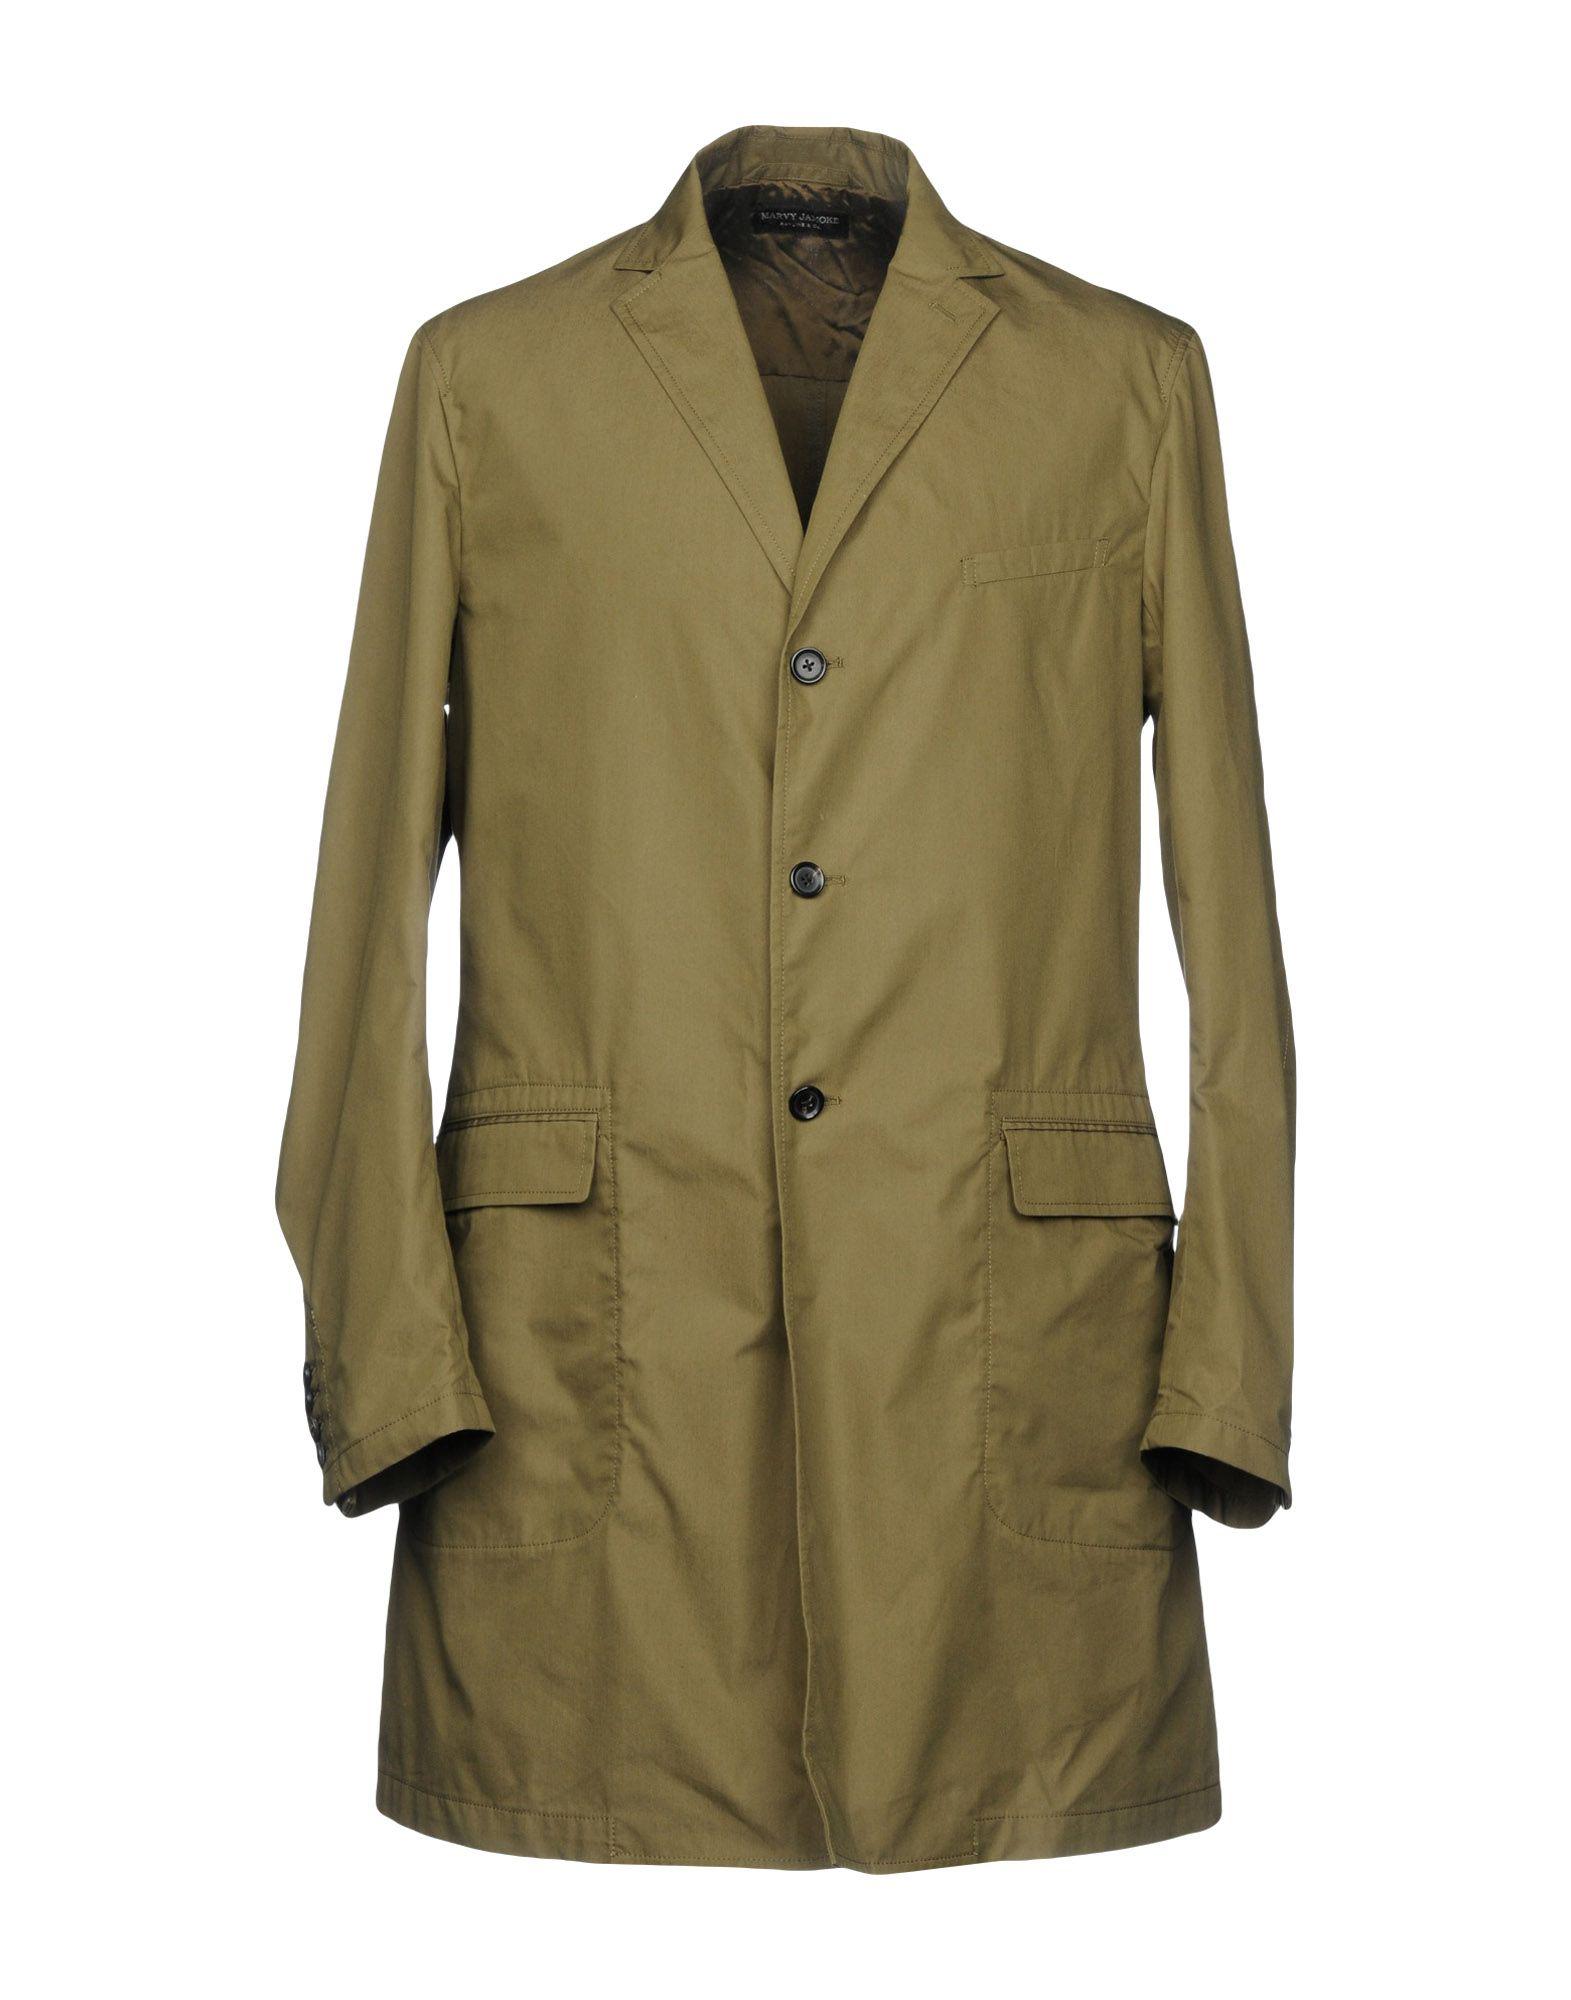 MARVY JAMOKE Full-Length Jacket in Military Green